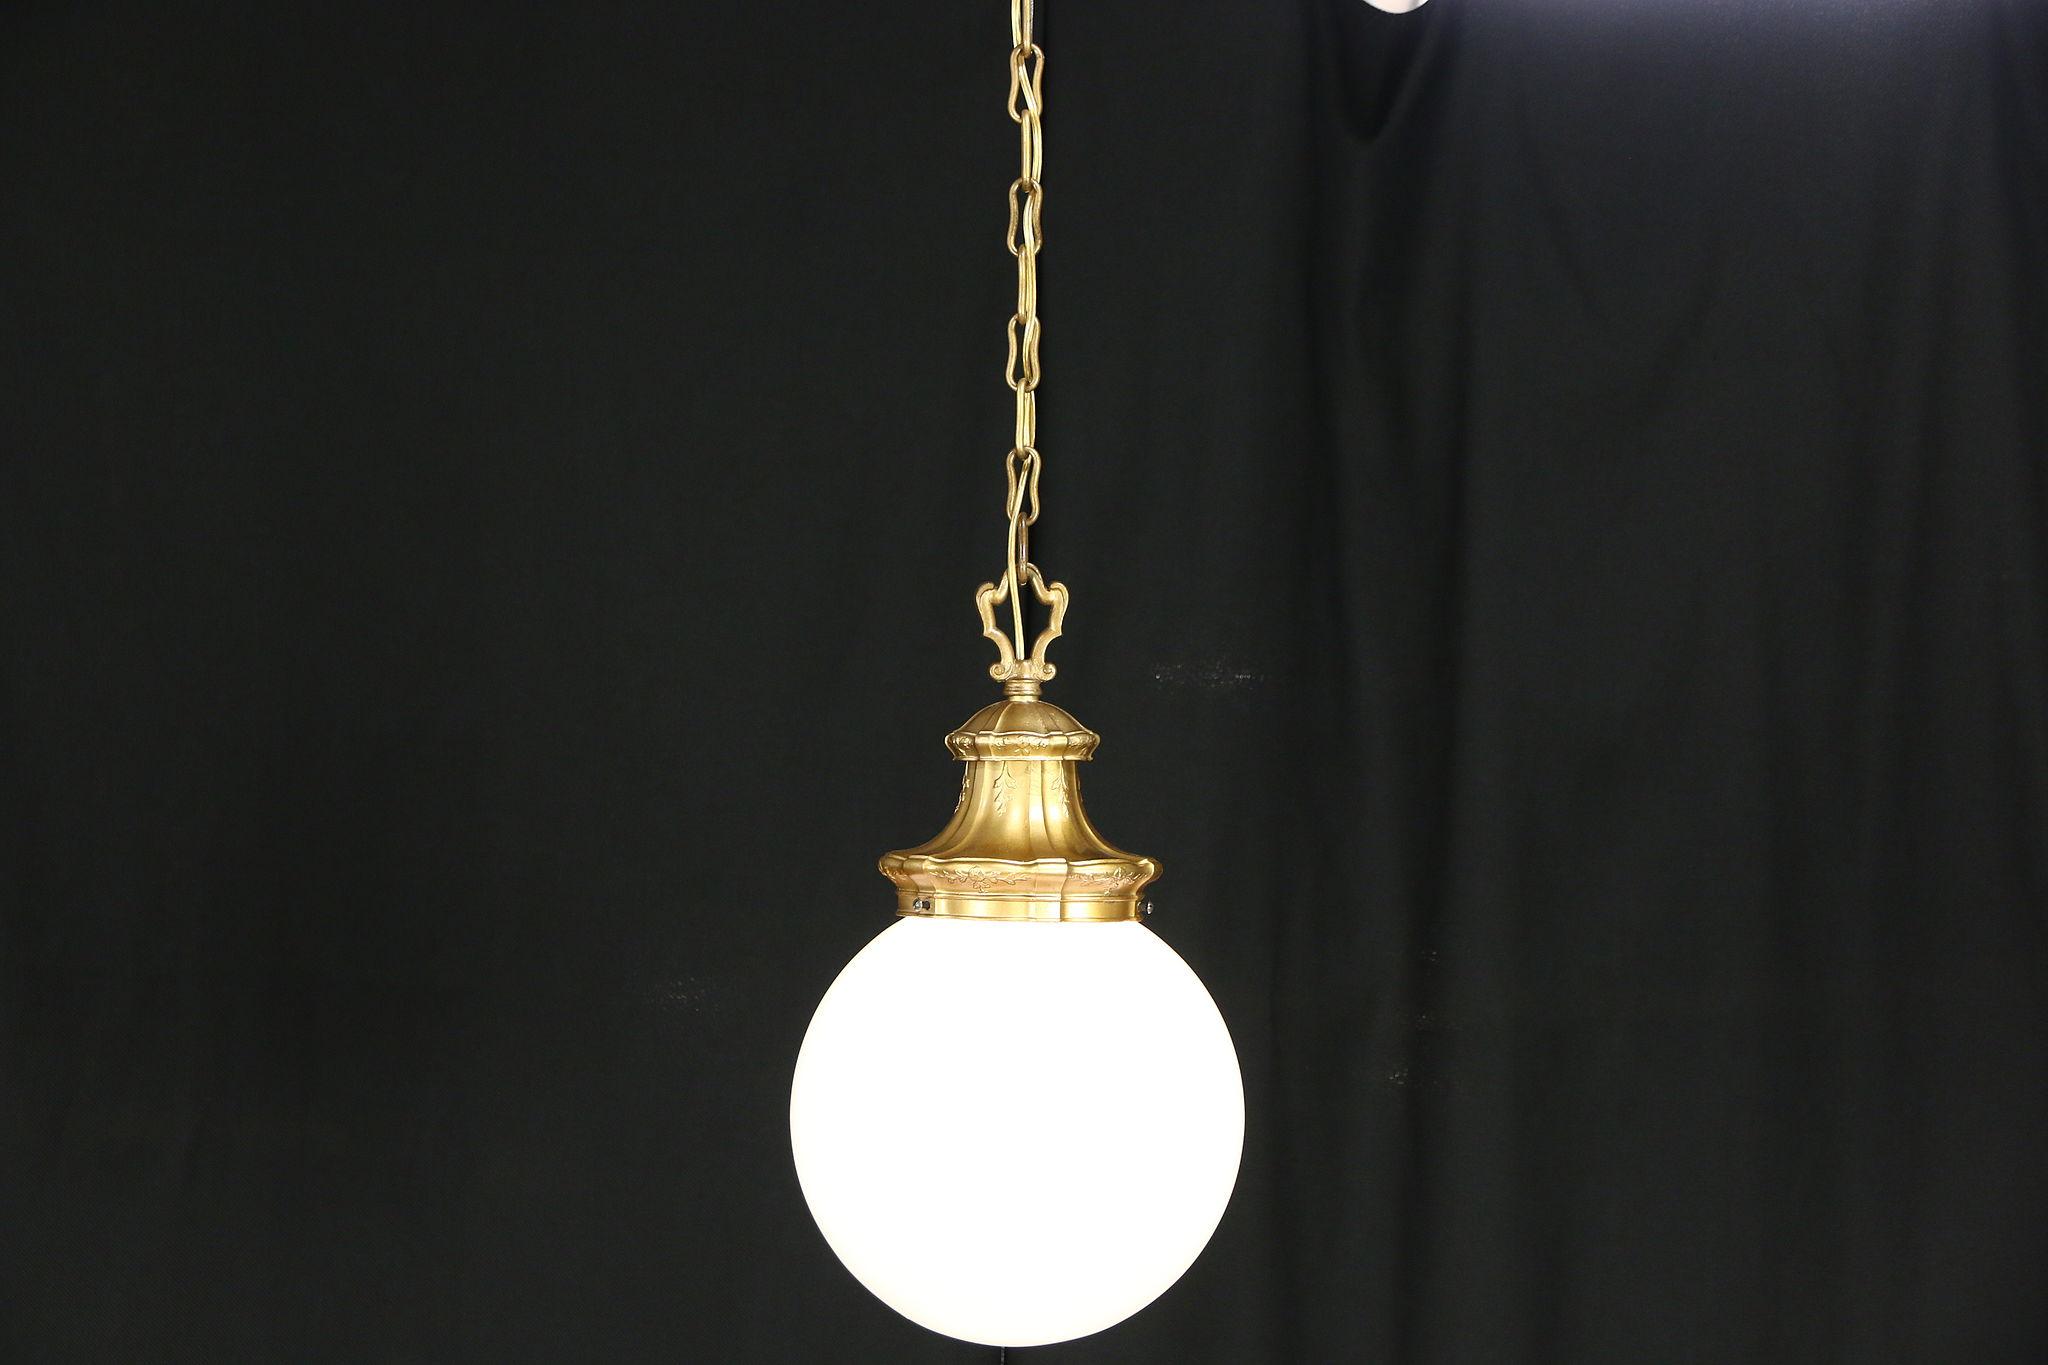 Sold pendant antique 1910 light fixture milk glass ball shade harp gallery